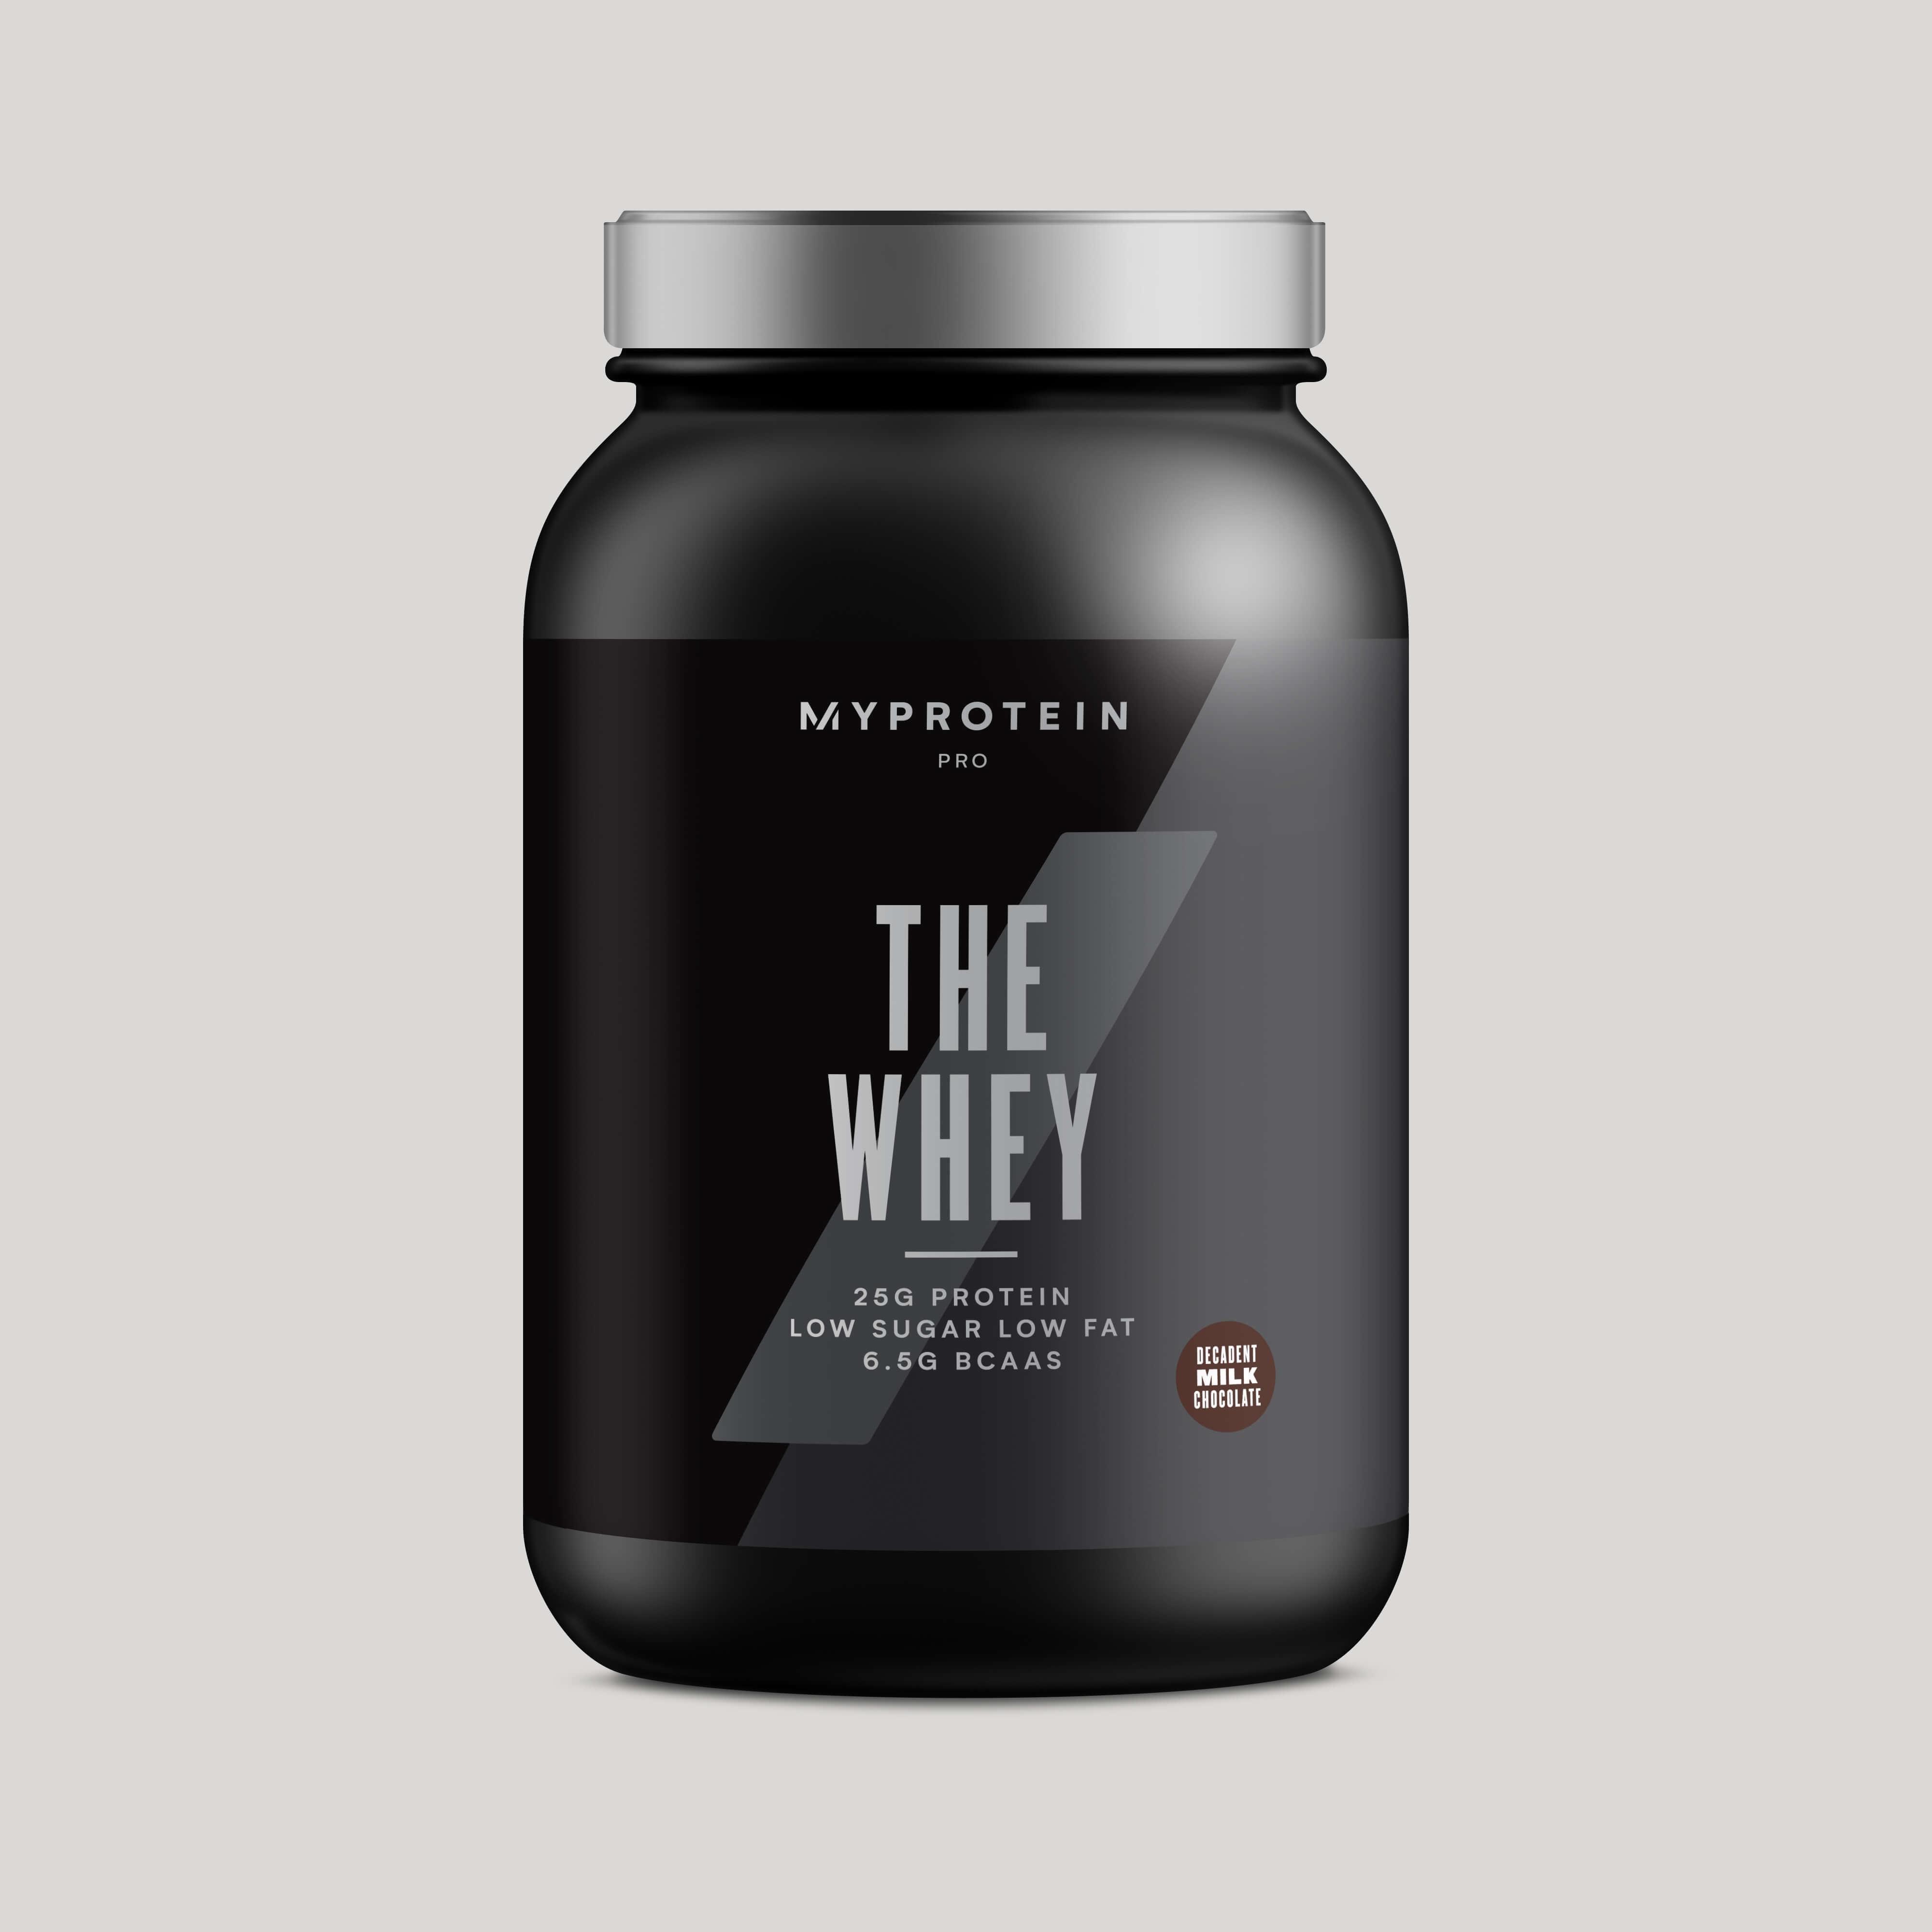 Proteína en polvo con mejor sabor